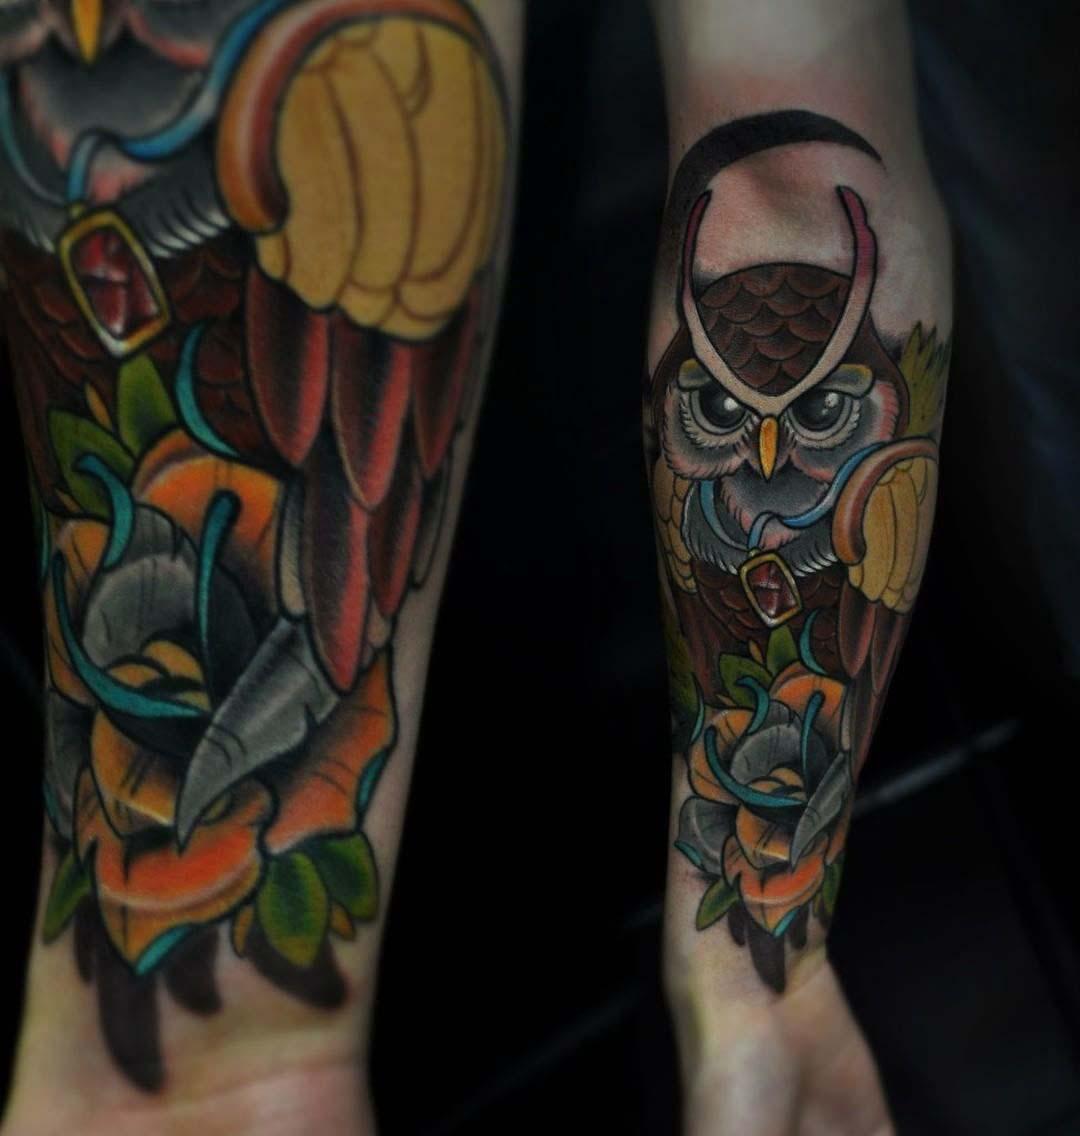 cool owl tattoo on forearm